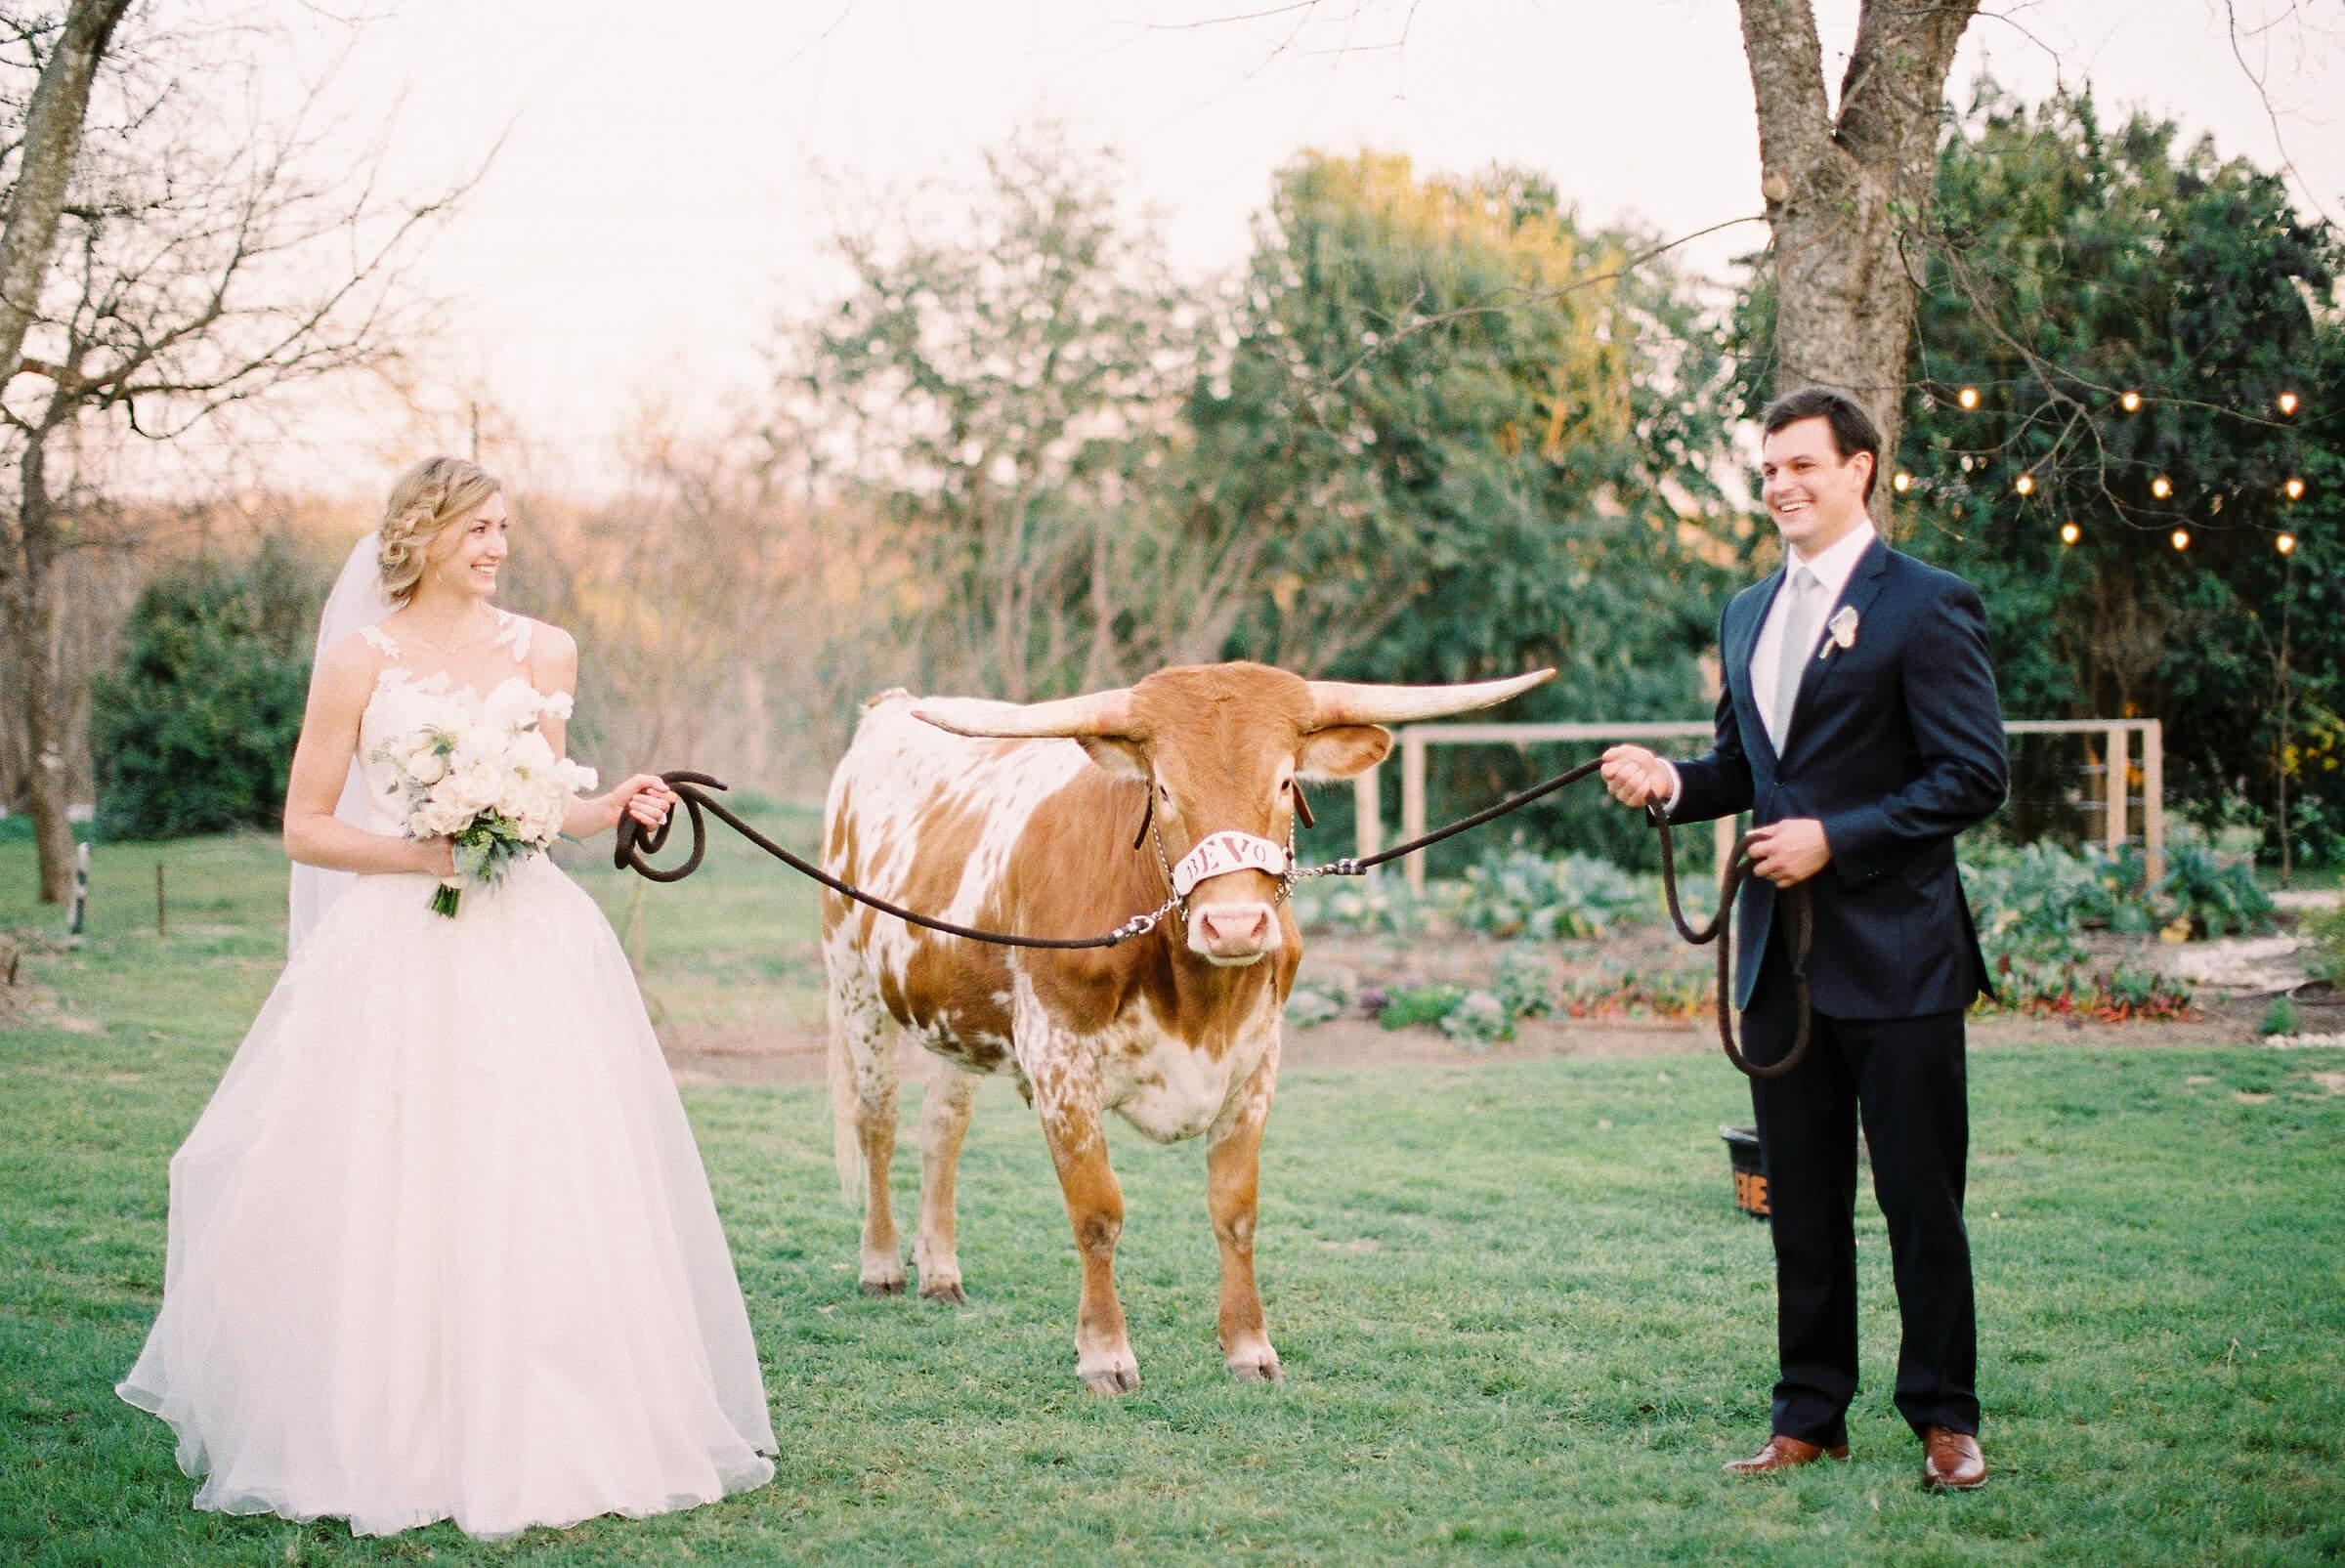 keara-william-wedding-673-2.jpg